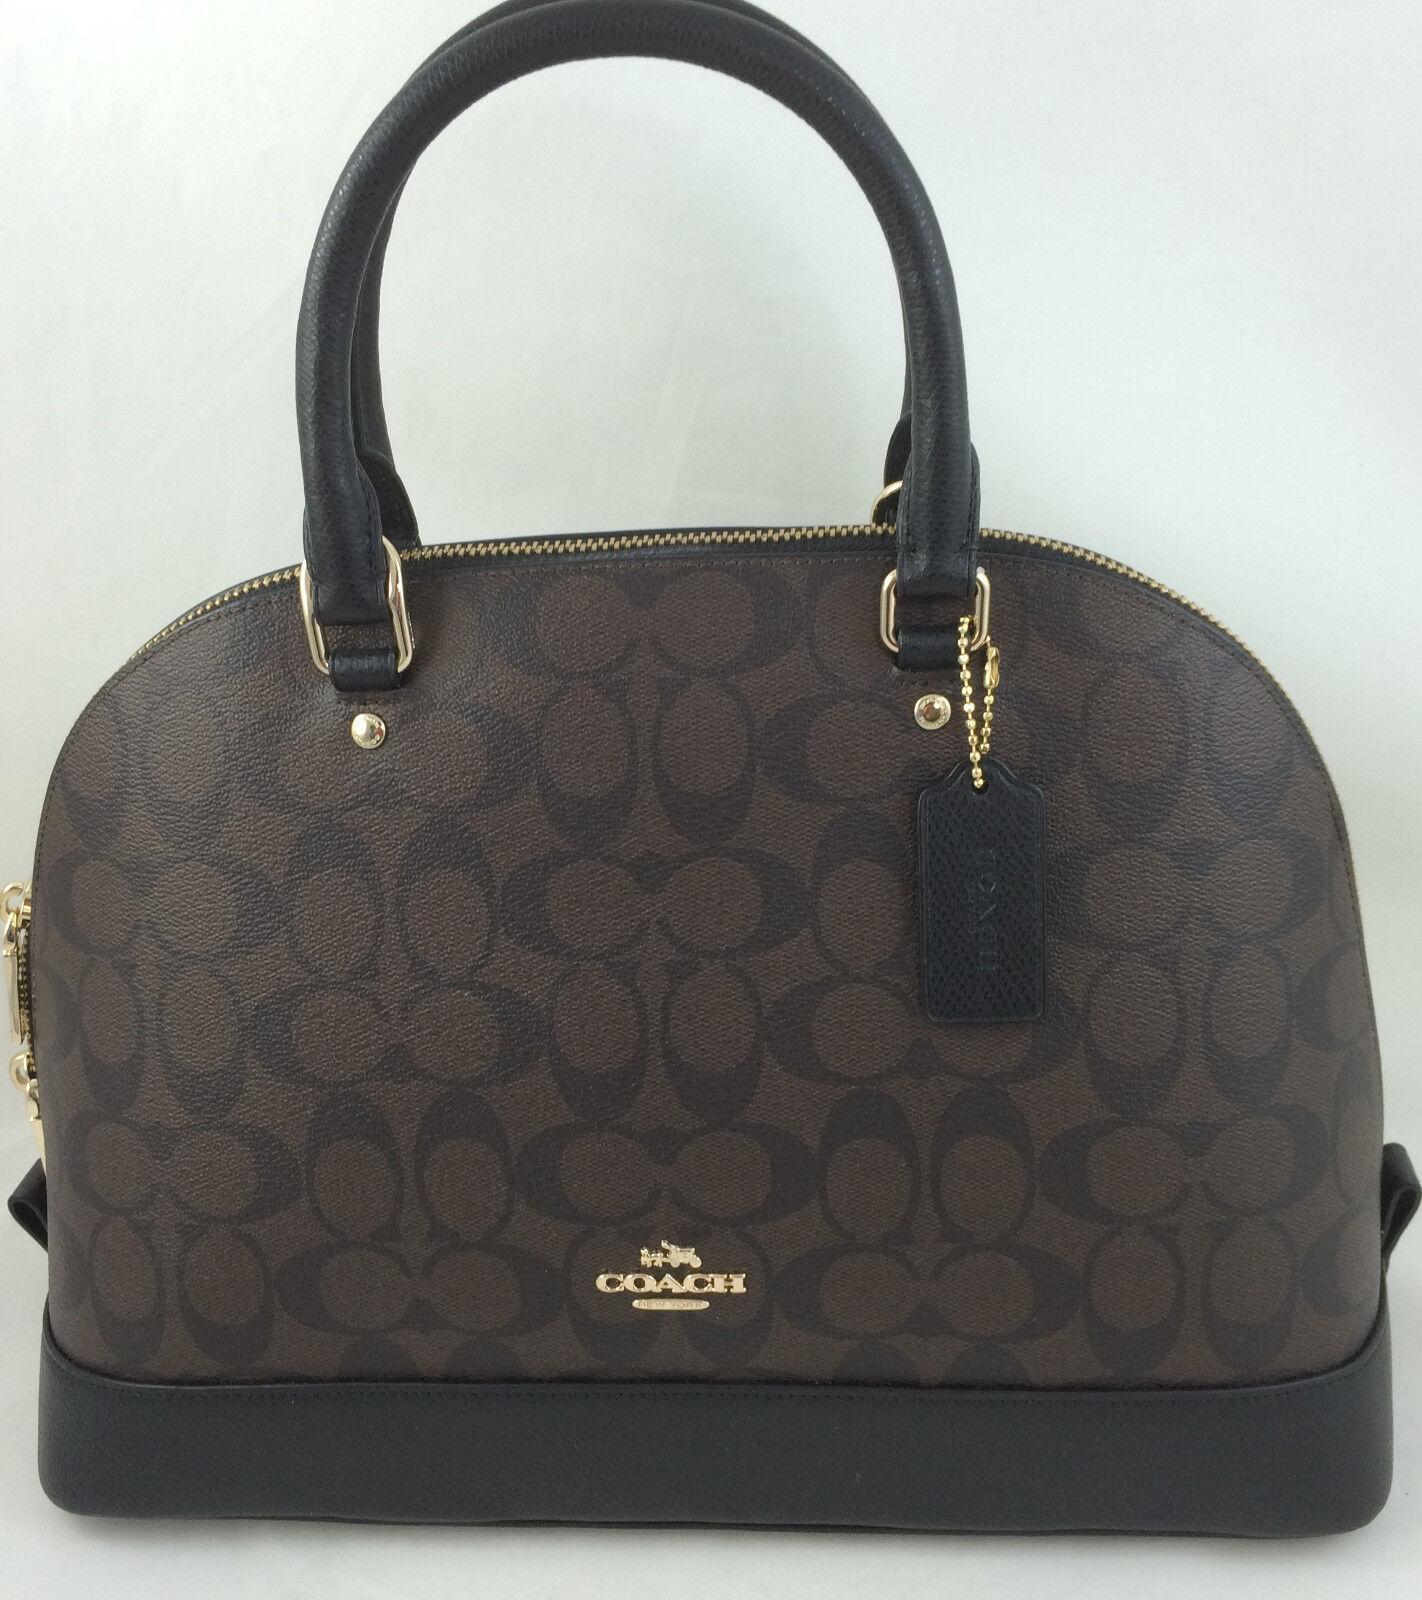 New Authentic Coach F27584 Sierra Signature Dome Satchel Handbag Purse Brown